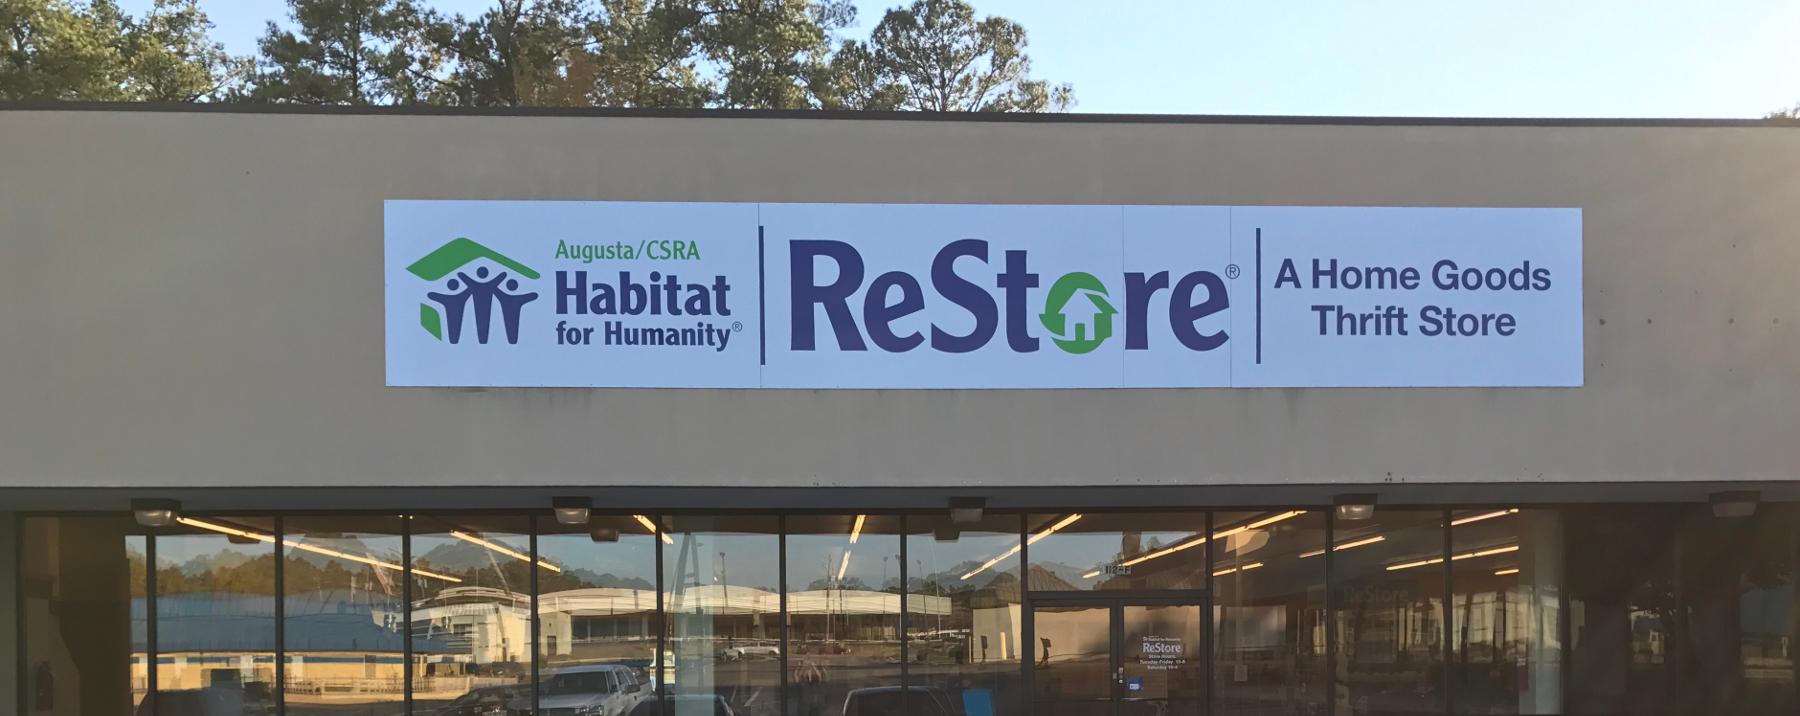 Restore Augusta Csra Habitat For Humanity